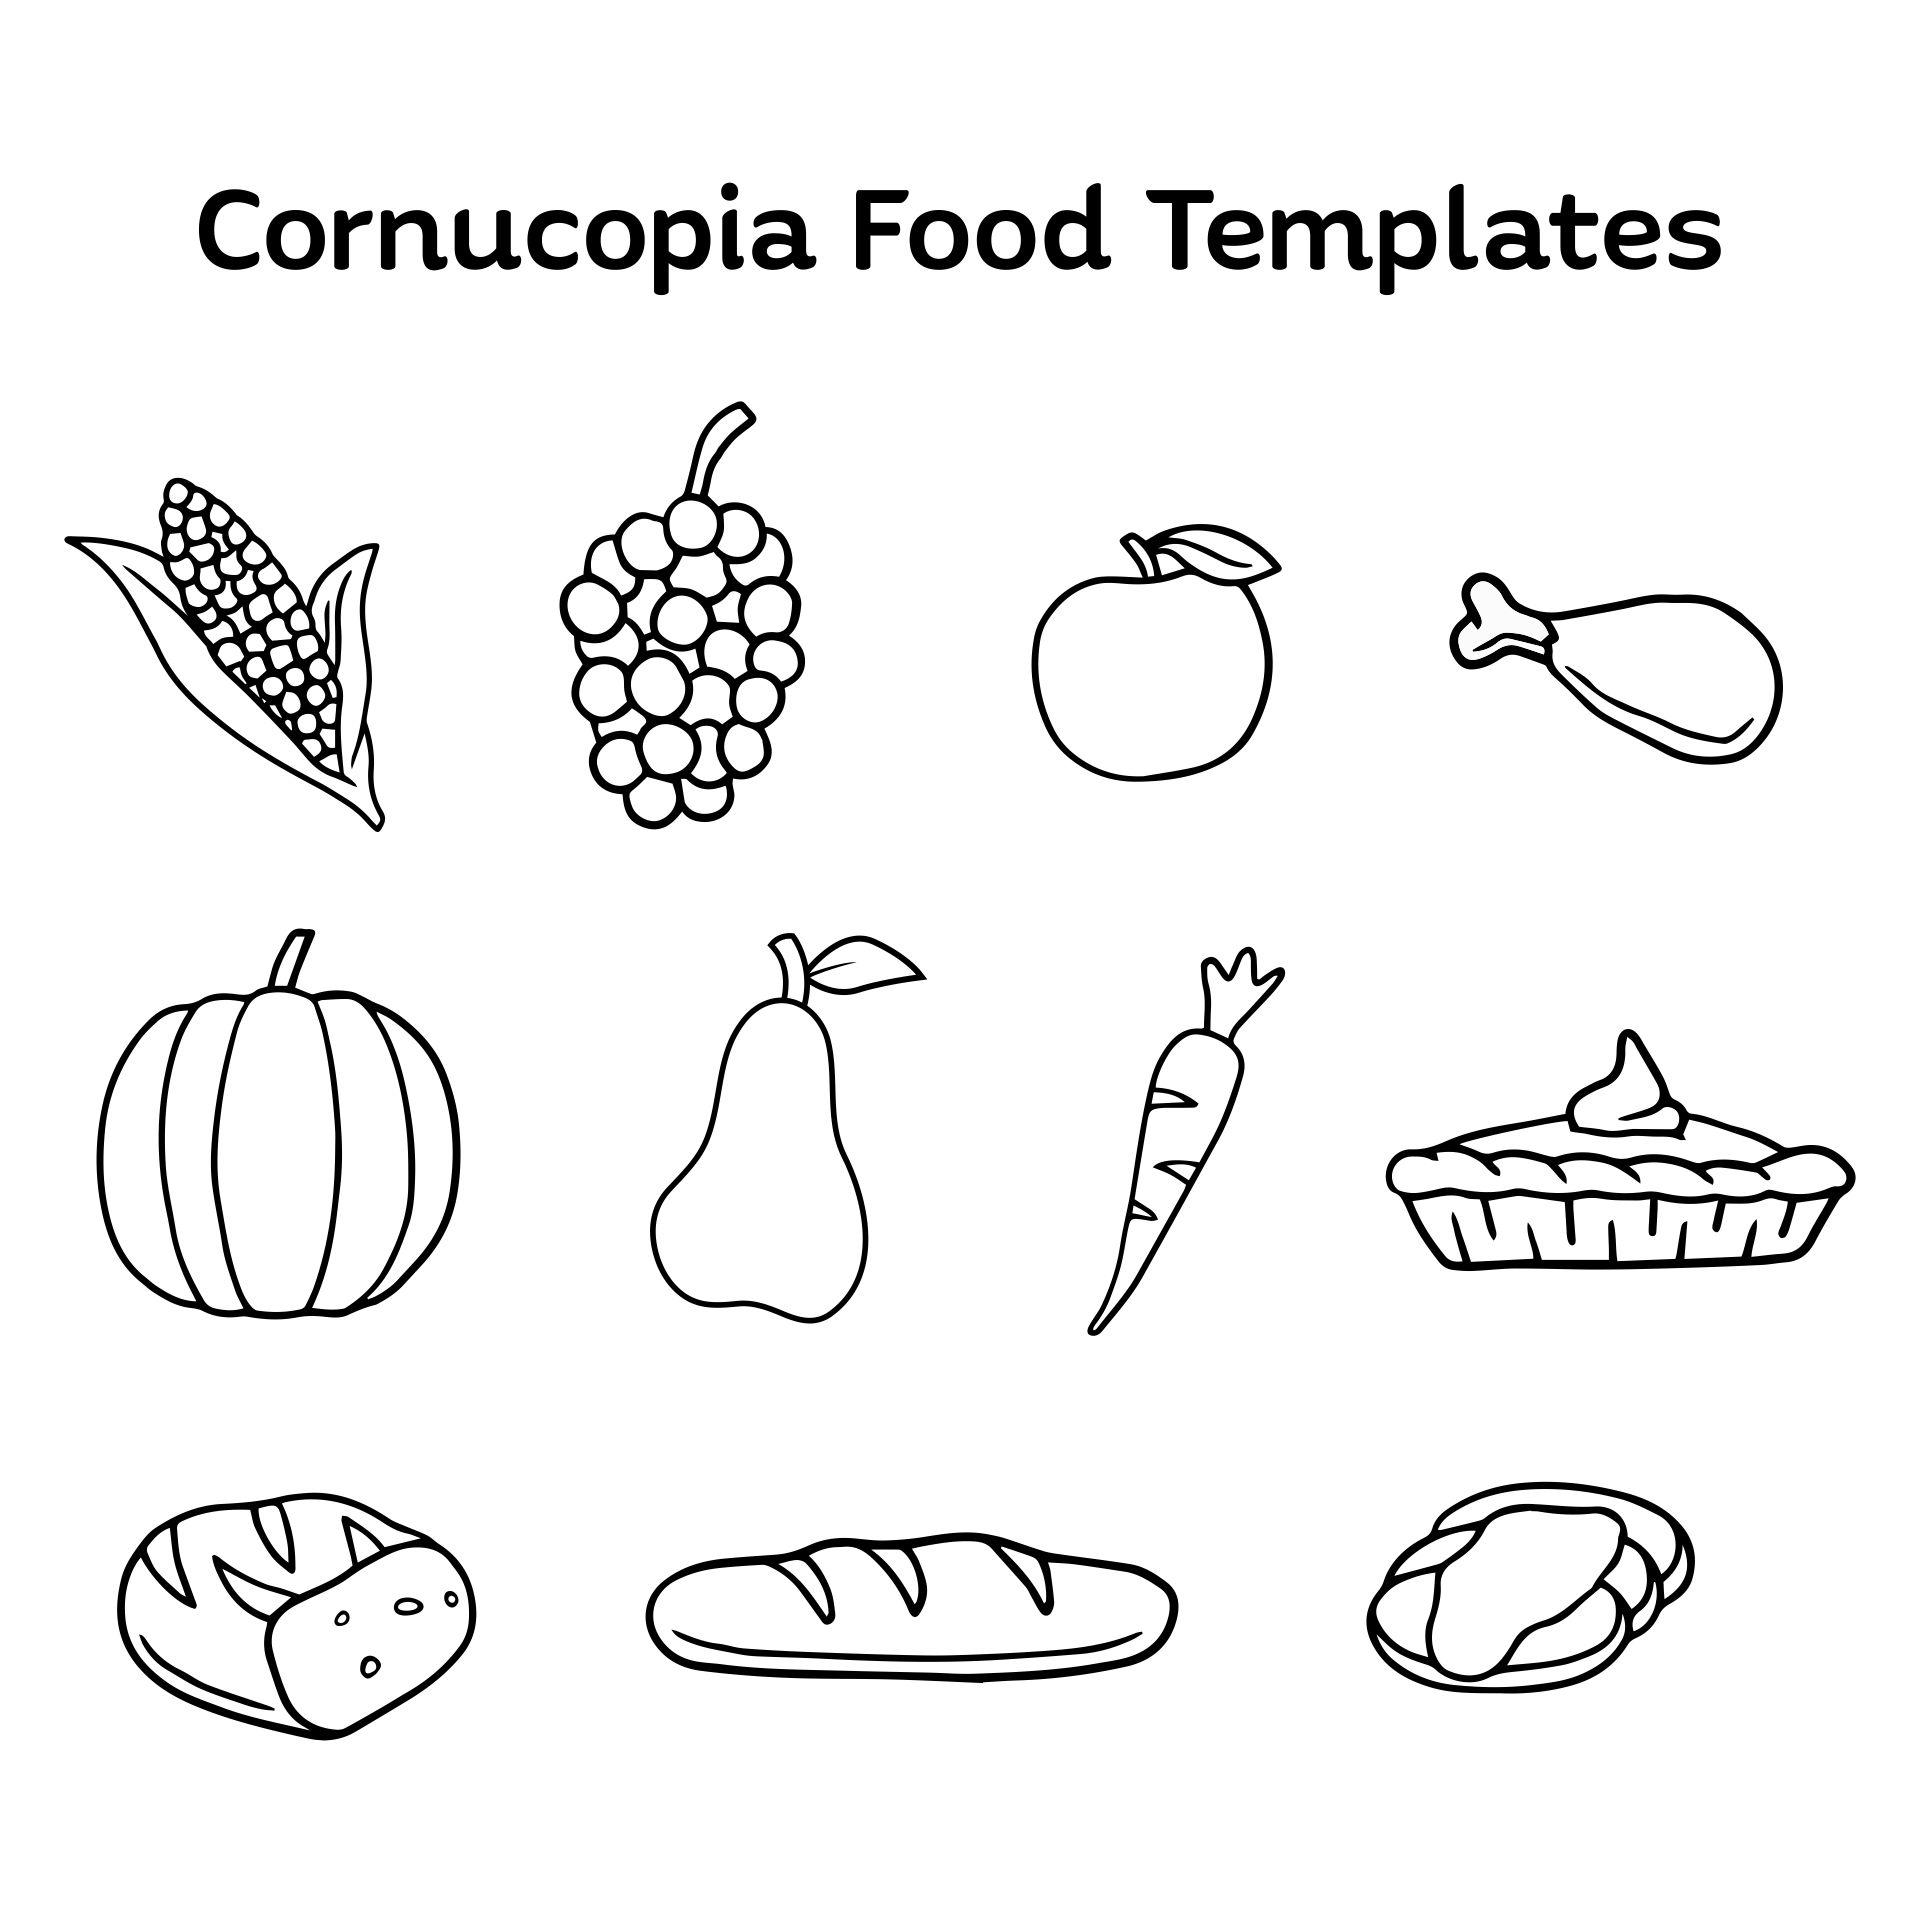 free printable cornucopia coloring pages - 6 best images of printable cornucopia craft free